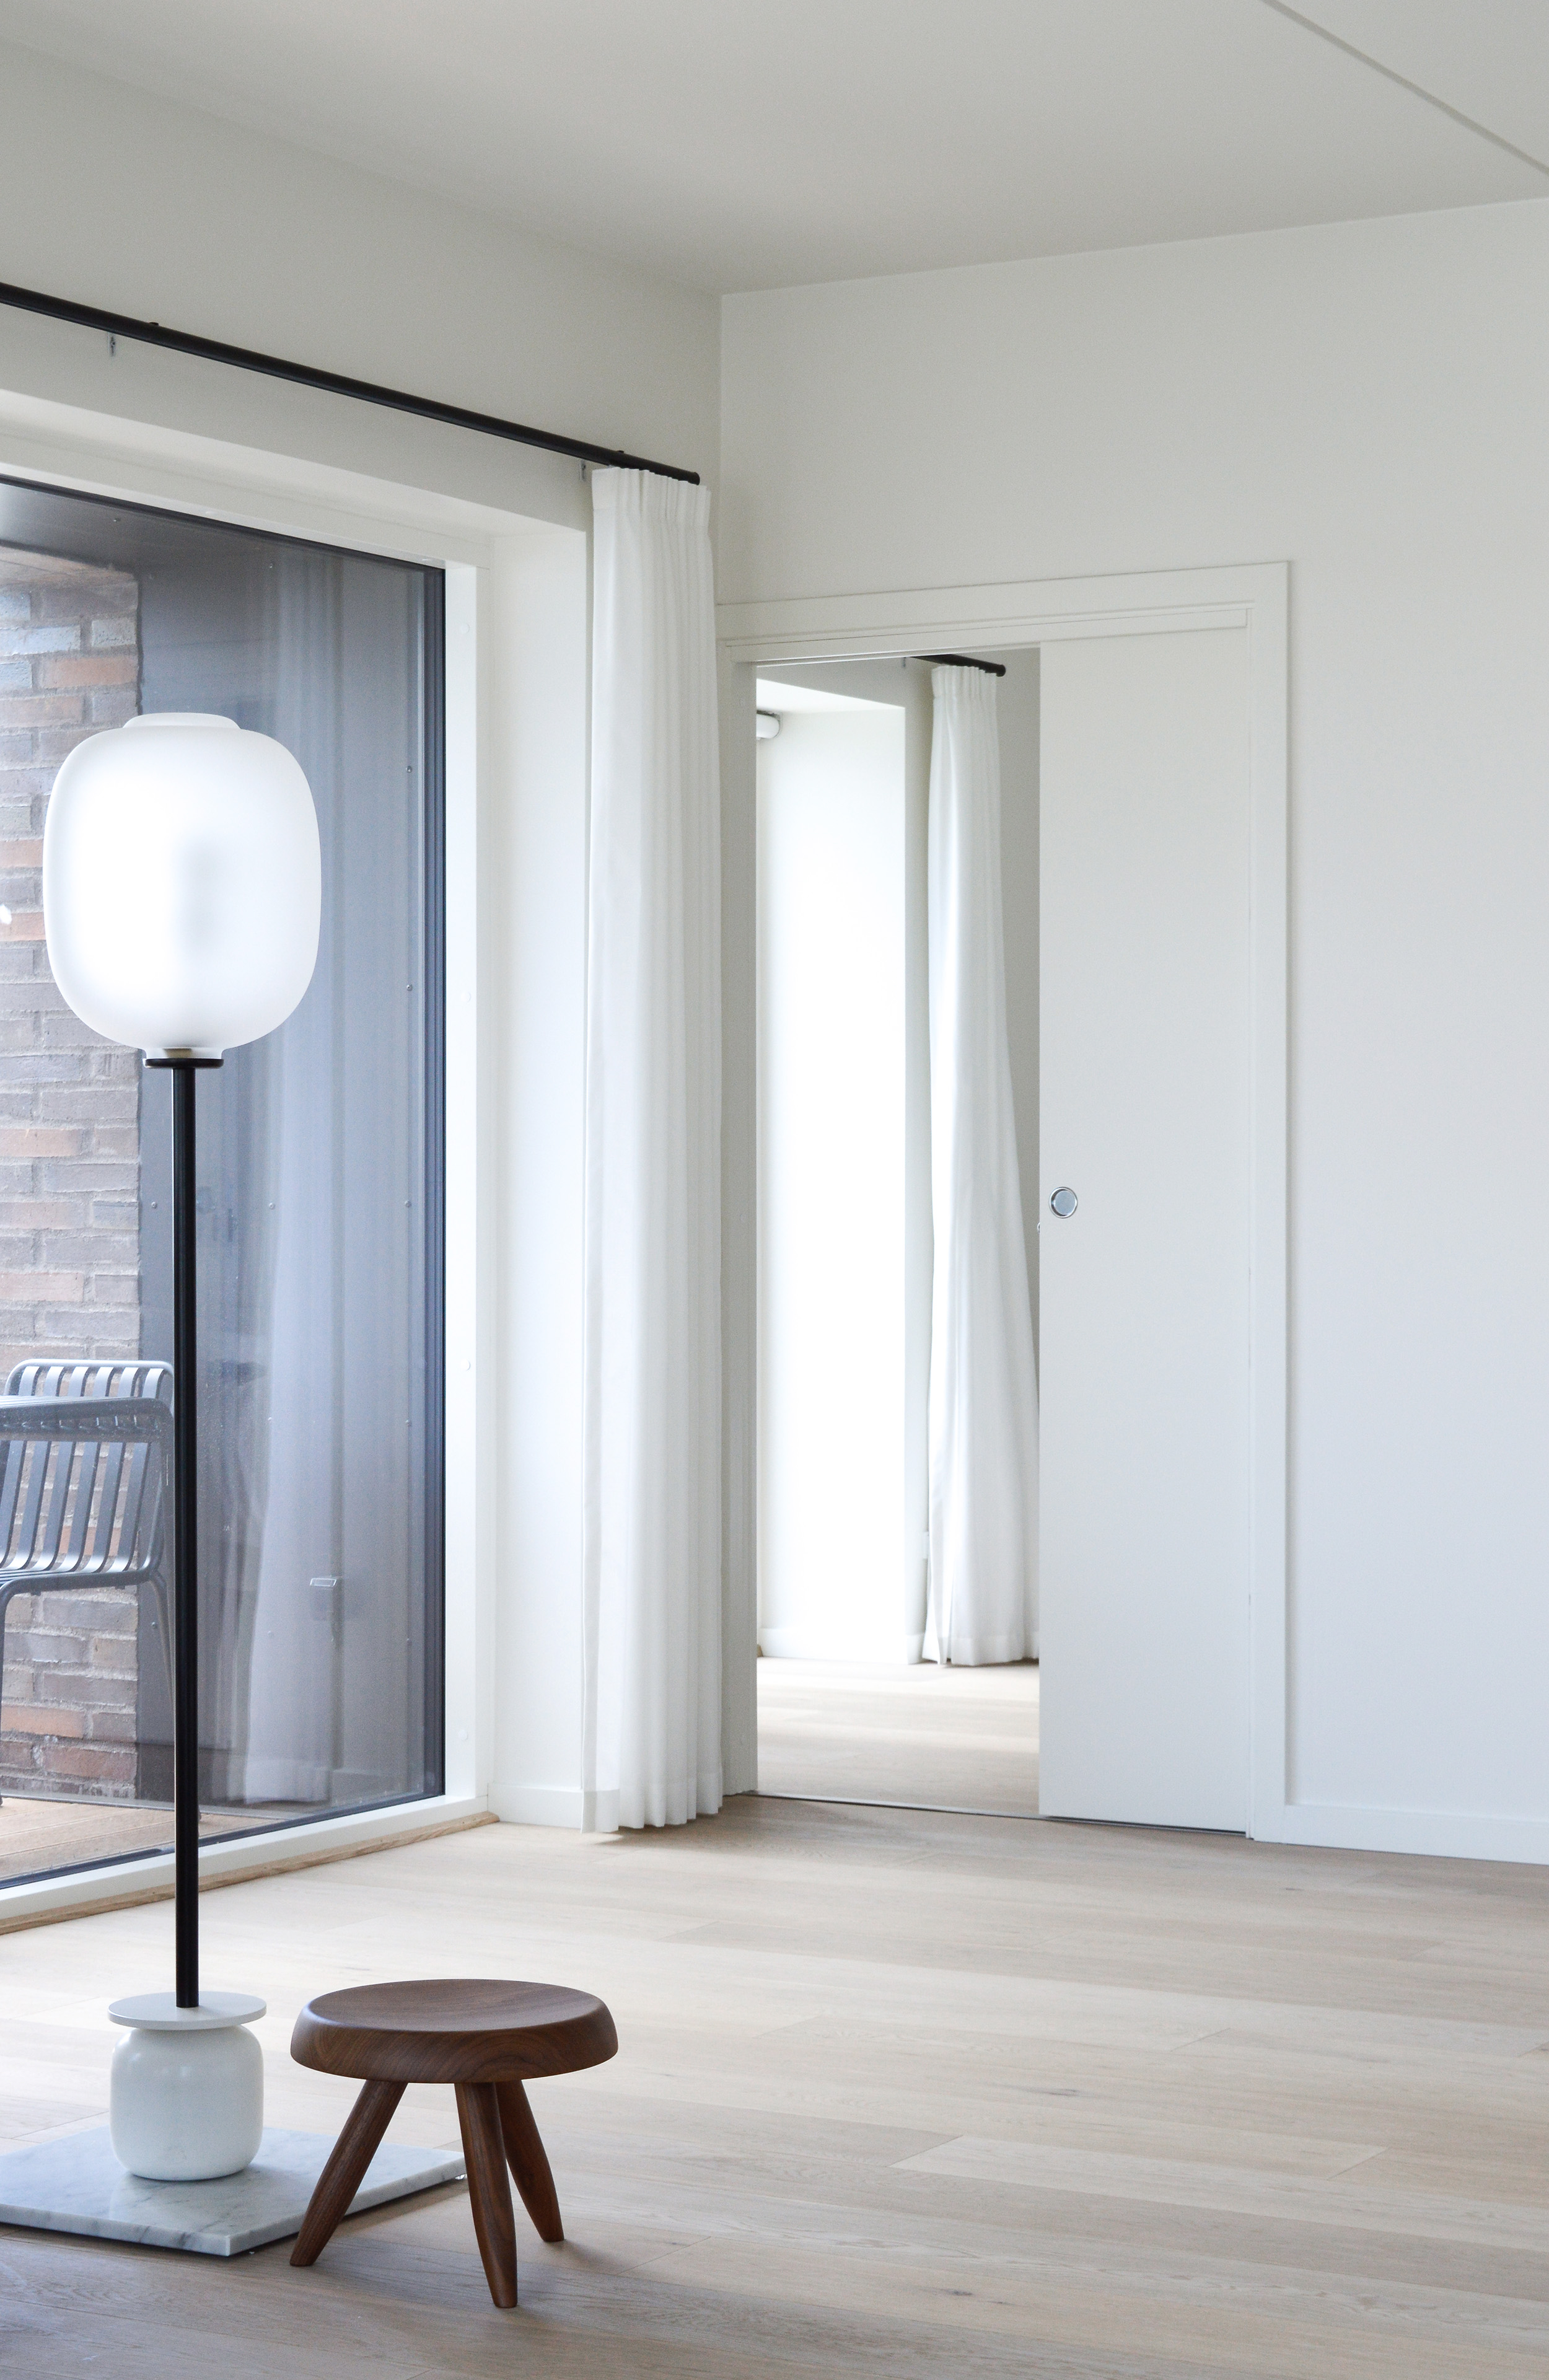 Stay Seaport, minimalist Scandinavian design apartment and Danish design hotel in Copenhagen